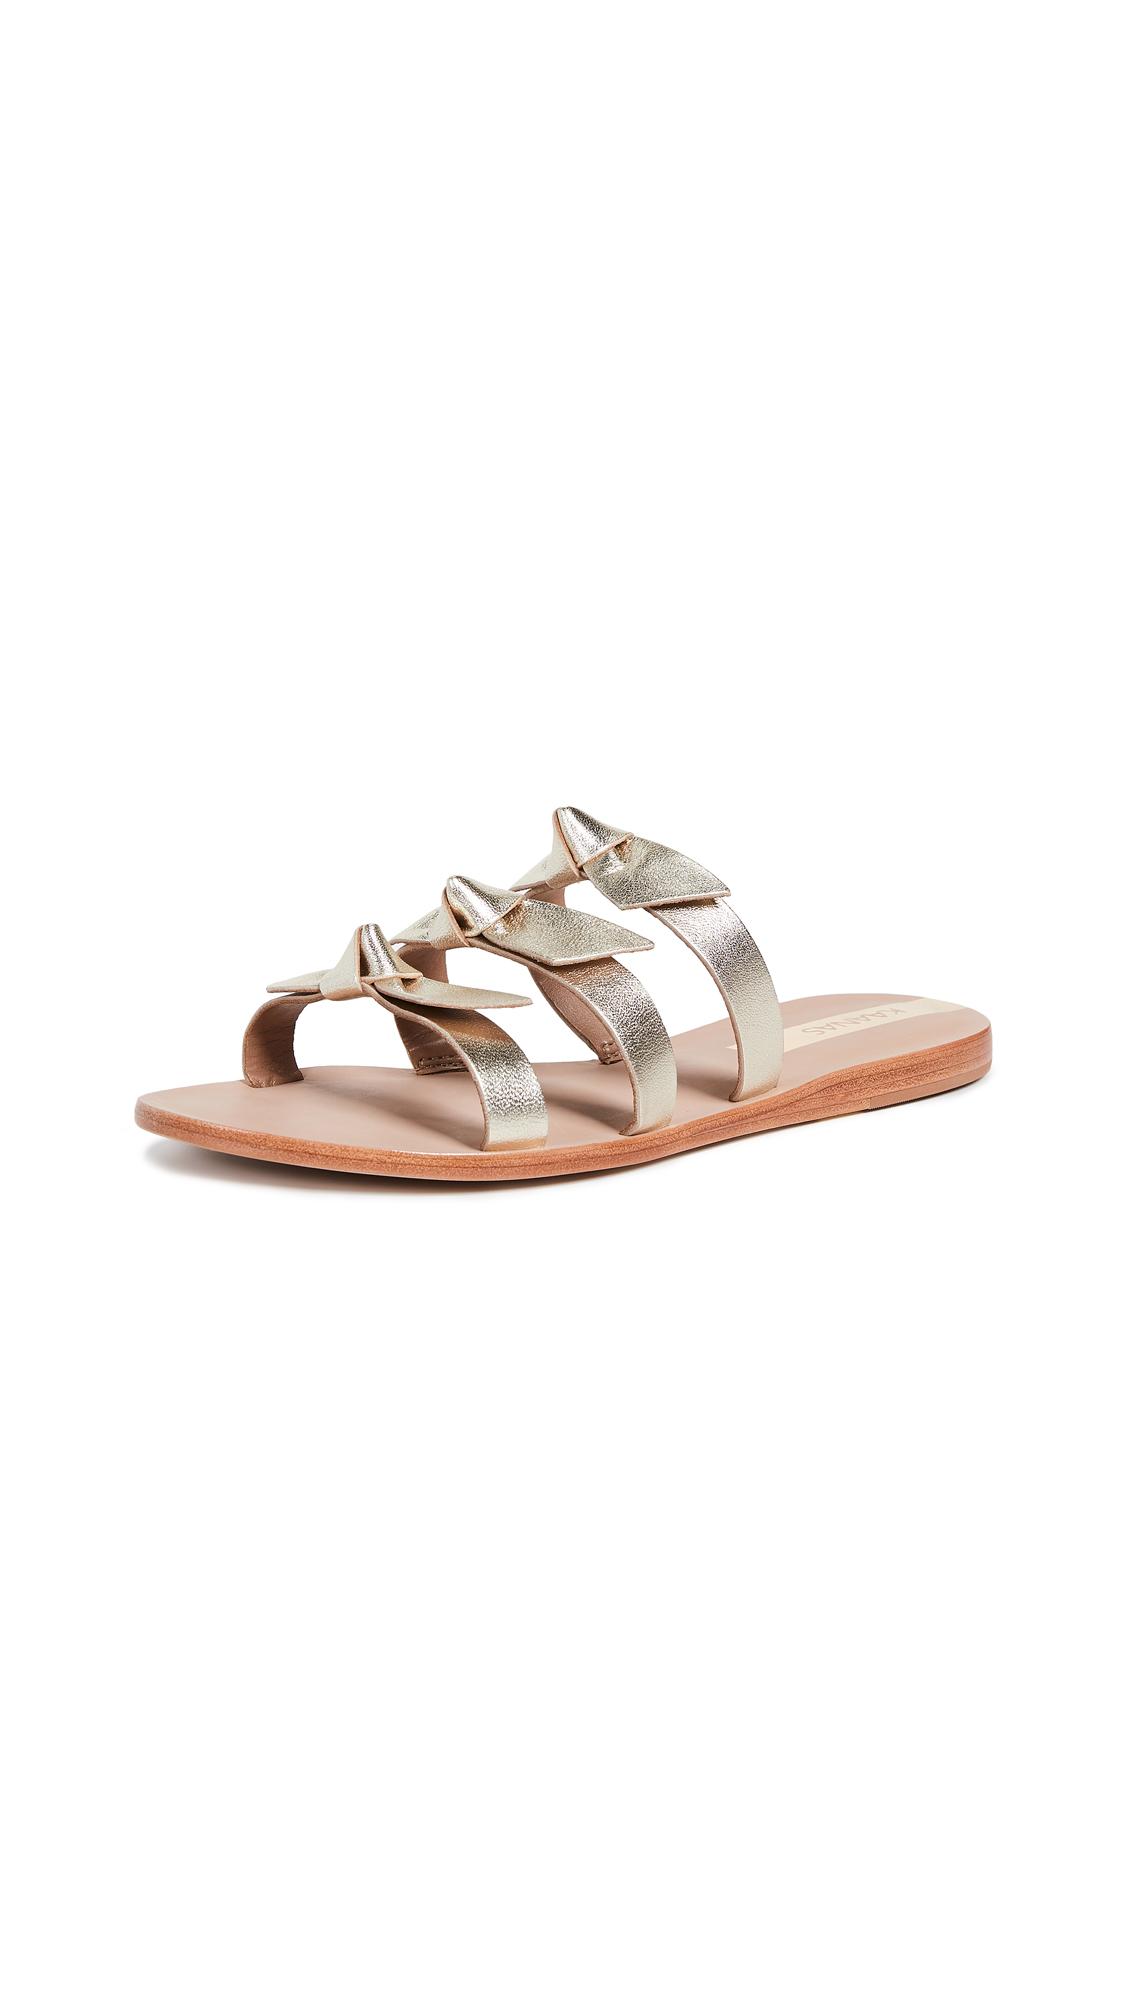 KAANAS Recife Bow Sandals - Gold